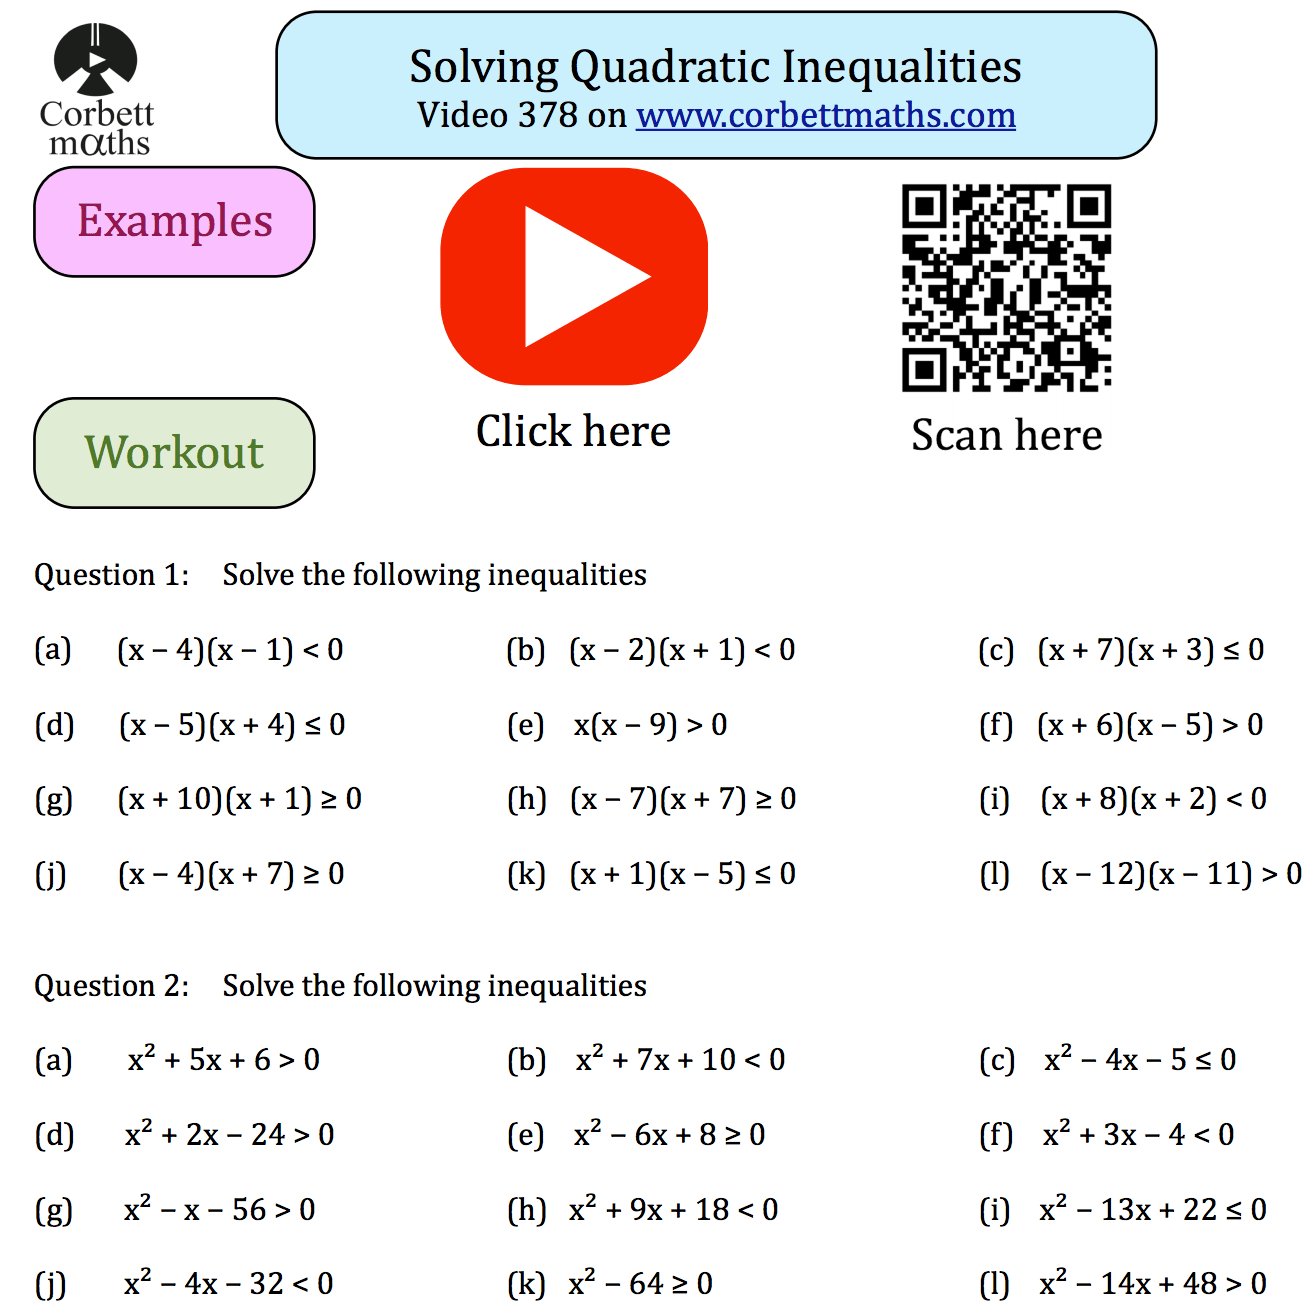 Solving Quadratic Inequalities Textbook Exercise Corbettmaths